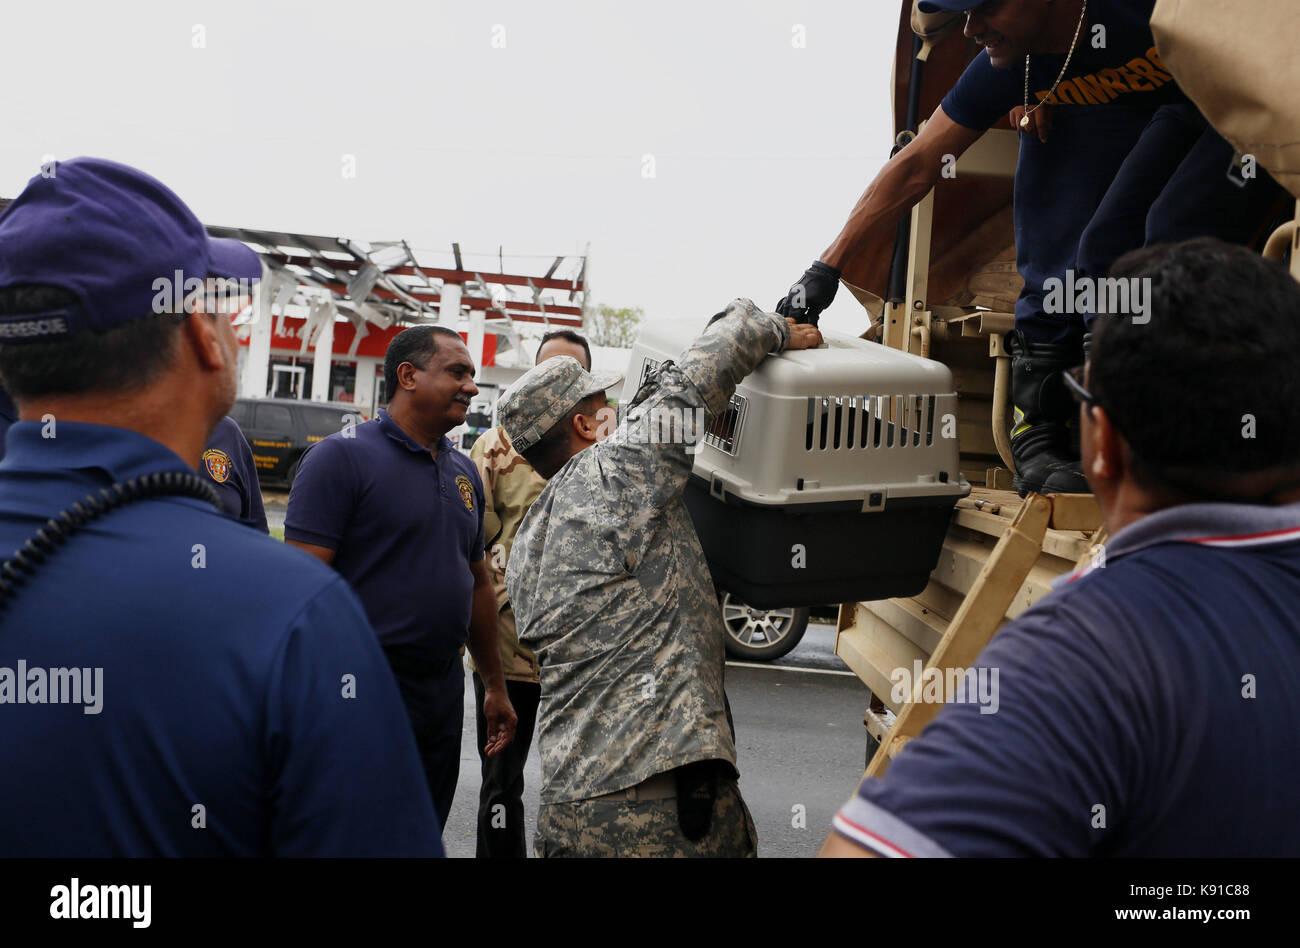 Toa Baja, Puerto Rico. 21st Sep, 2017. Emergencies personnel help neighbors who had to evacuate after hurricane - Stock Image